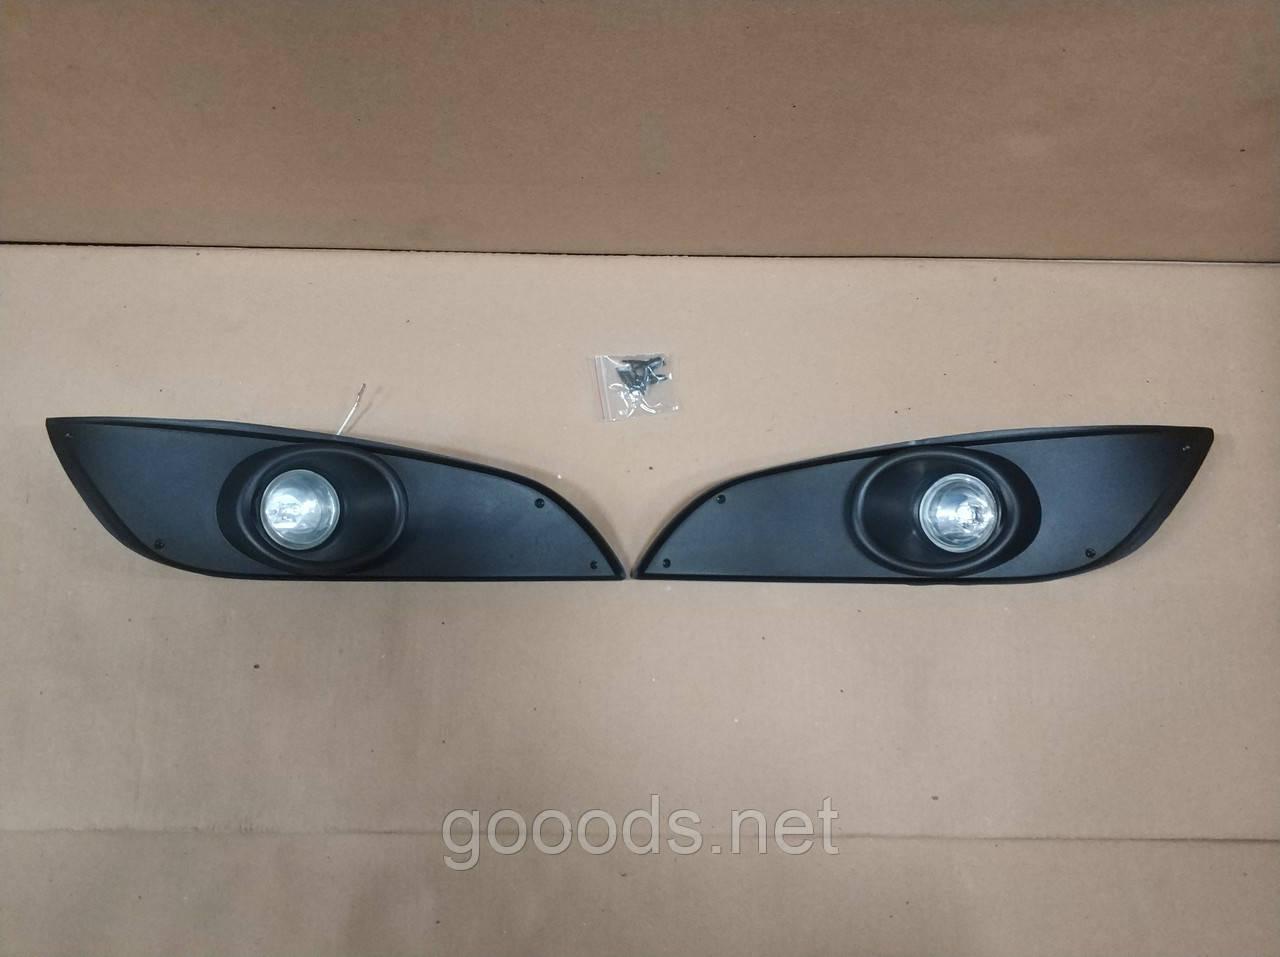 Фари протитуманні Opel Astra H (07-09)